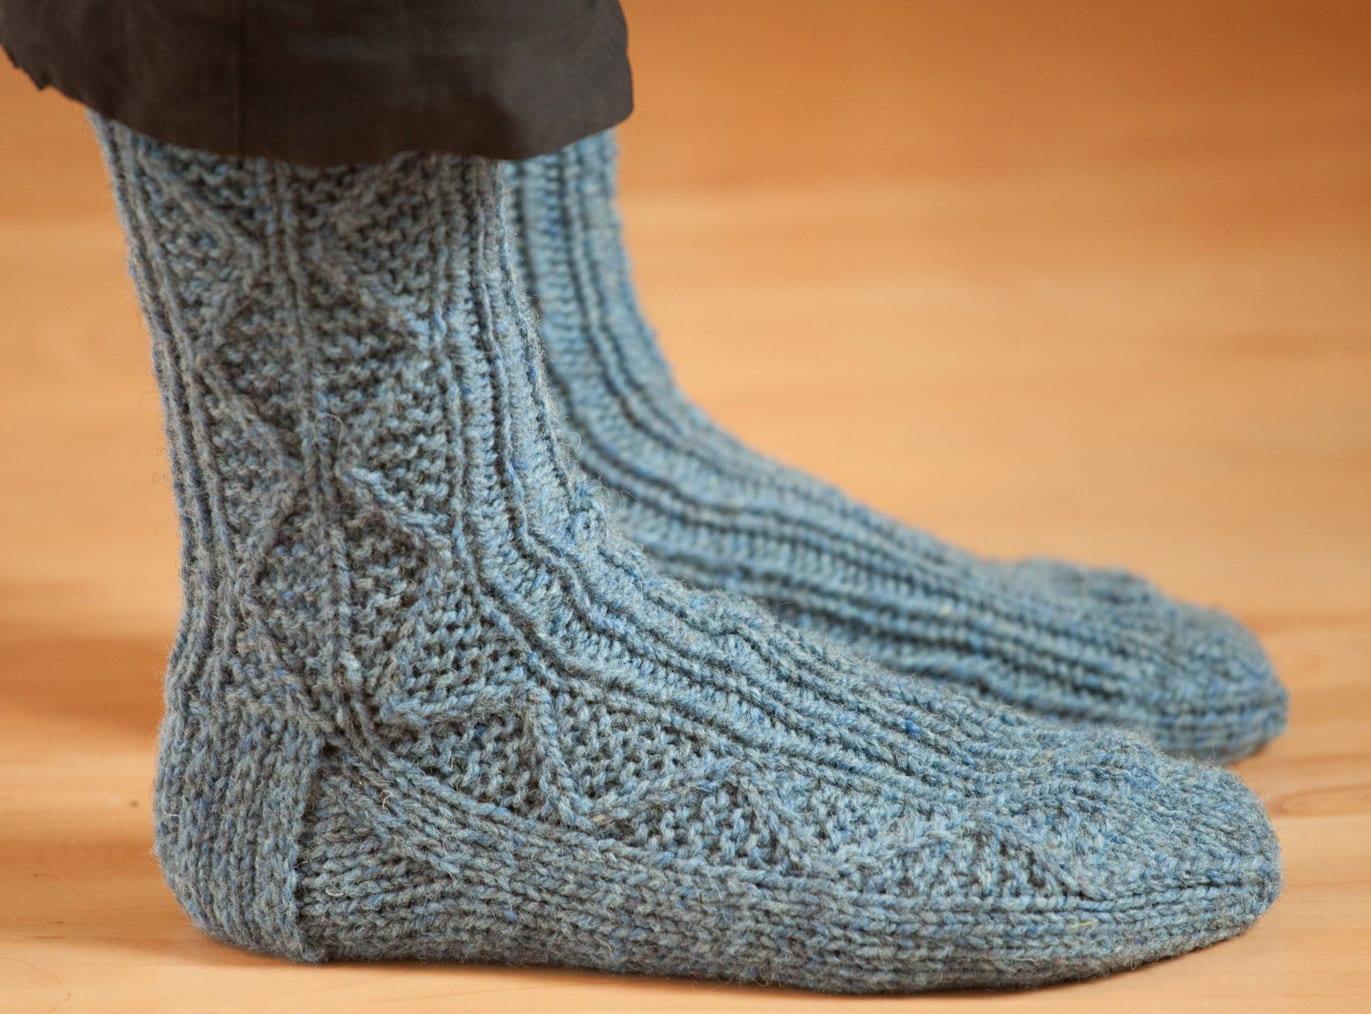 Sock Knitting Pattern PDF, Knitted Socks Pattern, Knit Socks ...